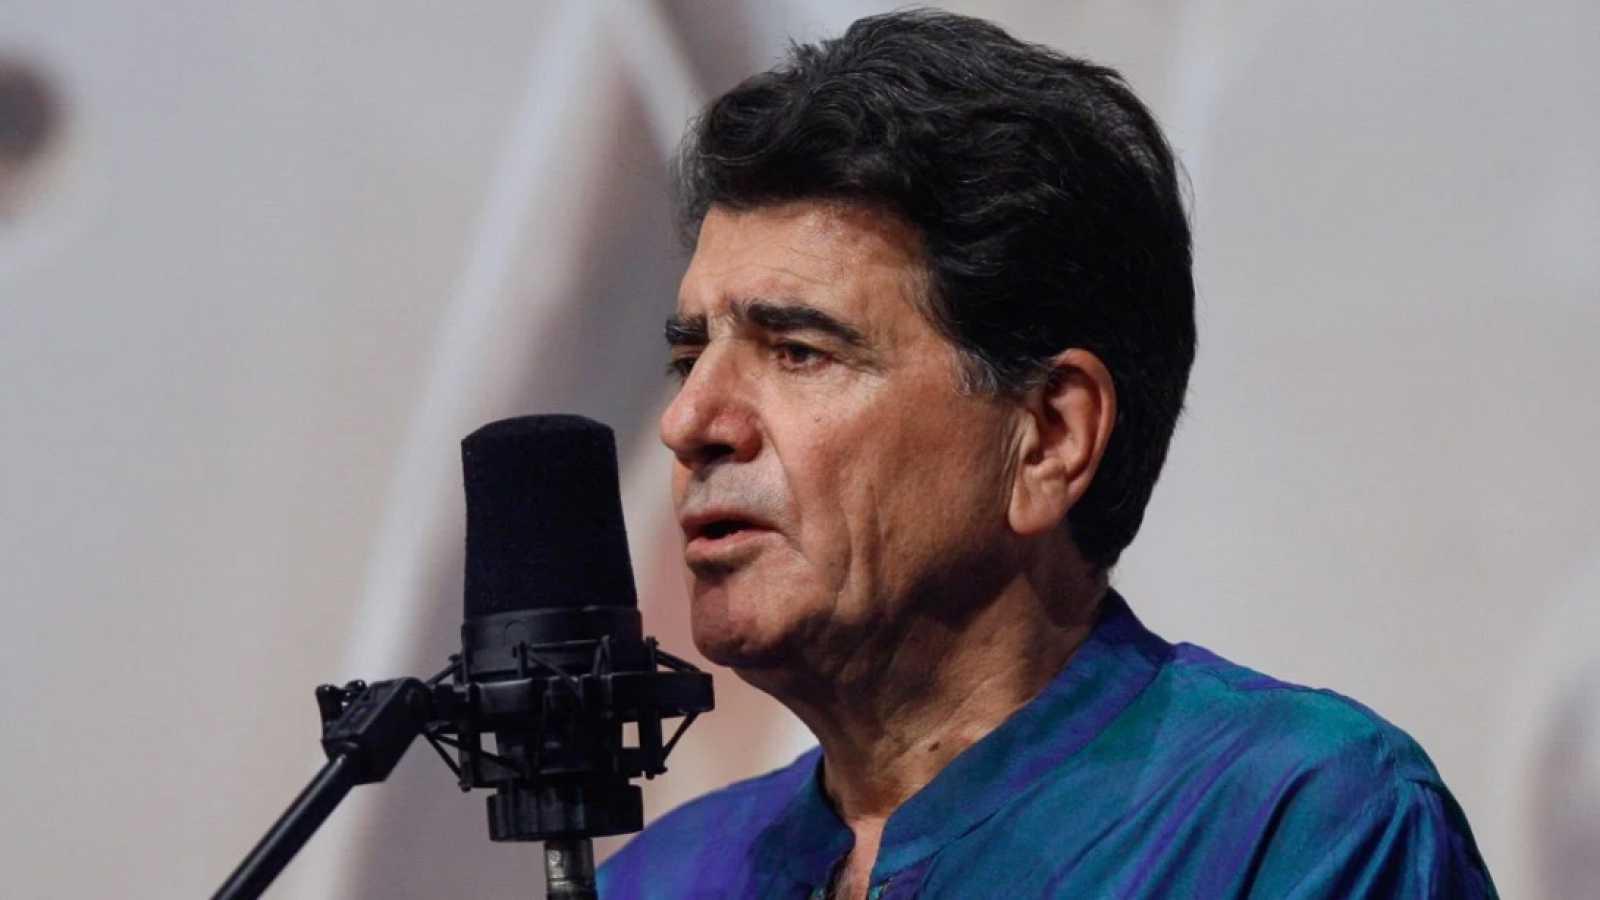 Asia hoy - Irán llora al gran maestro Shajarian - 09/10/20 - escuchar ahora